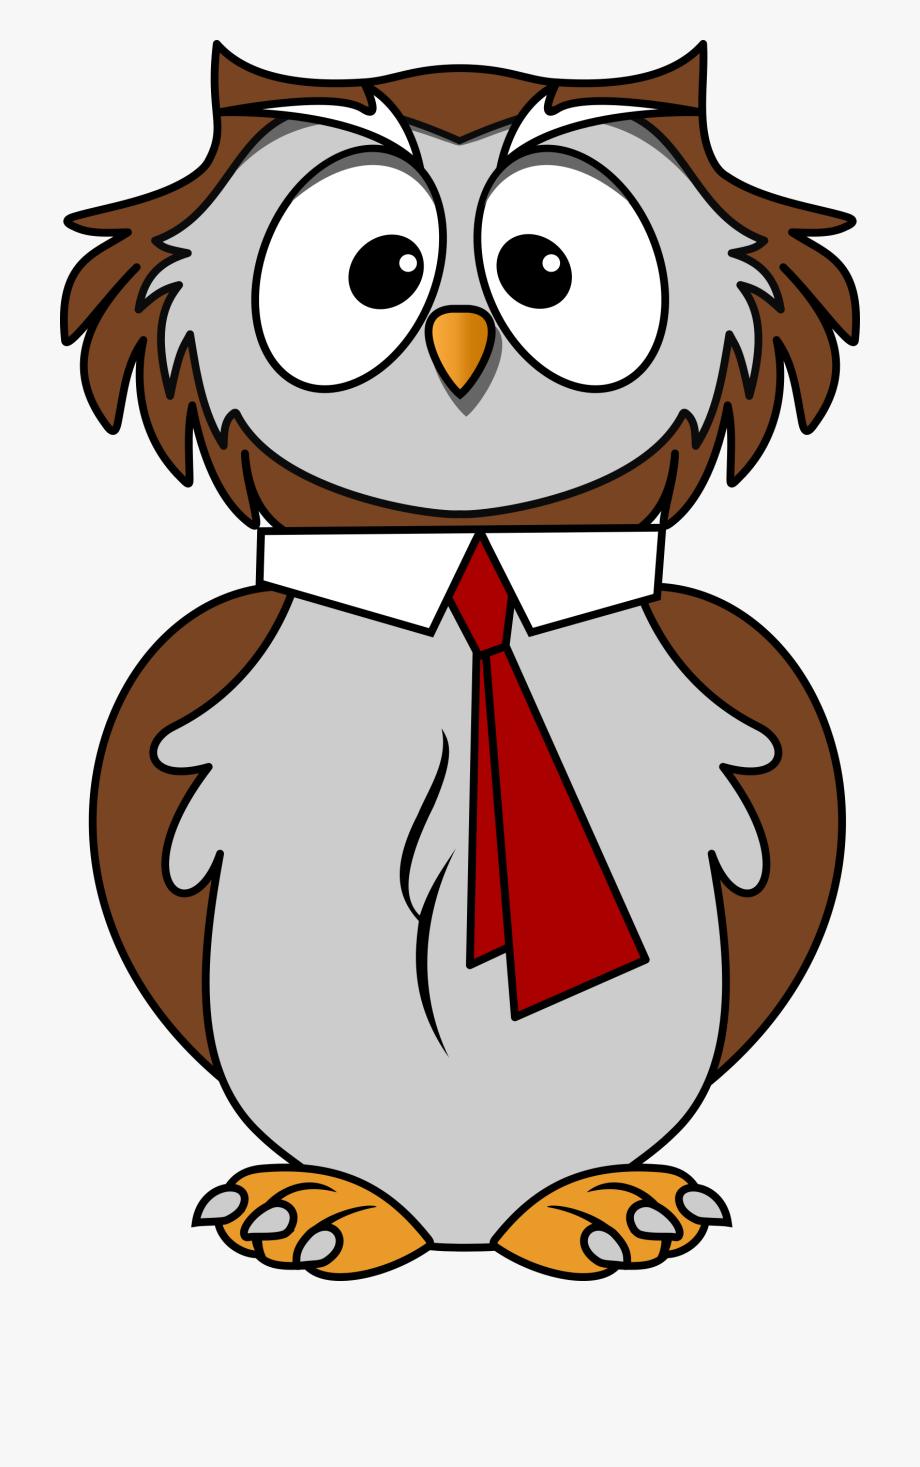 Cartoon Owl Clipart At Getdrawings.